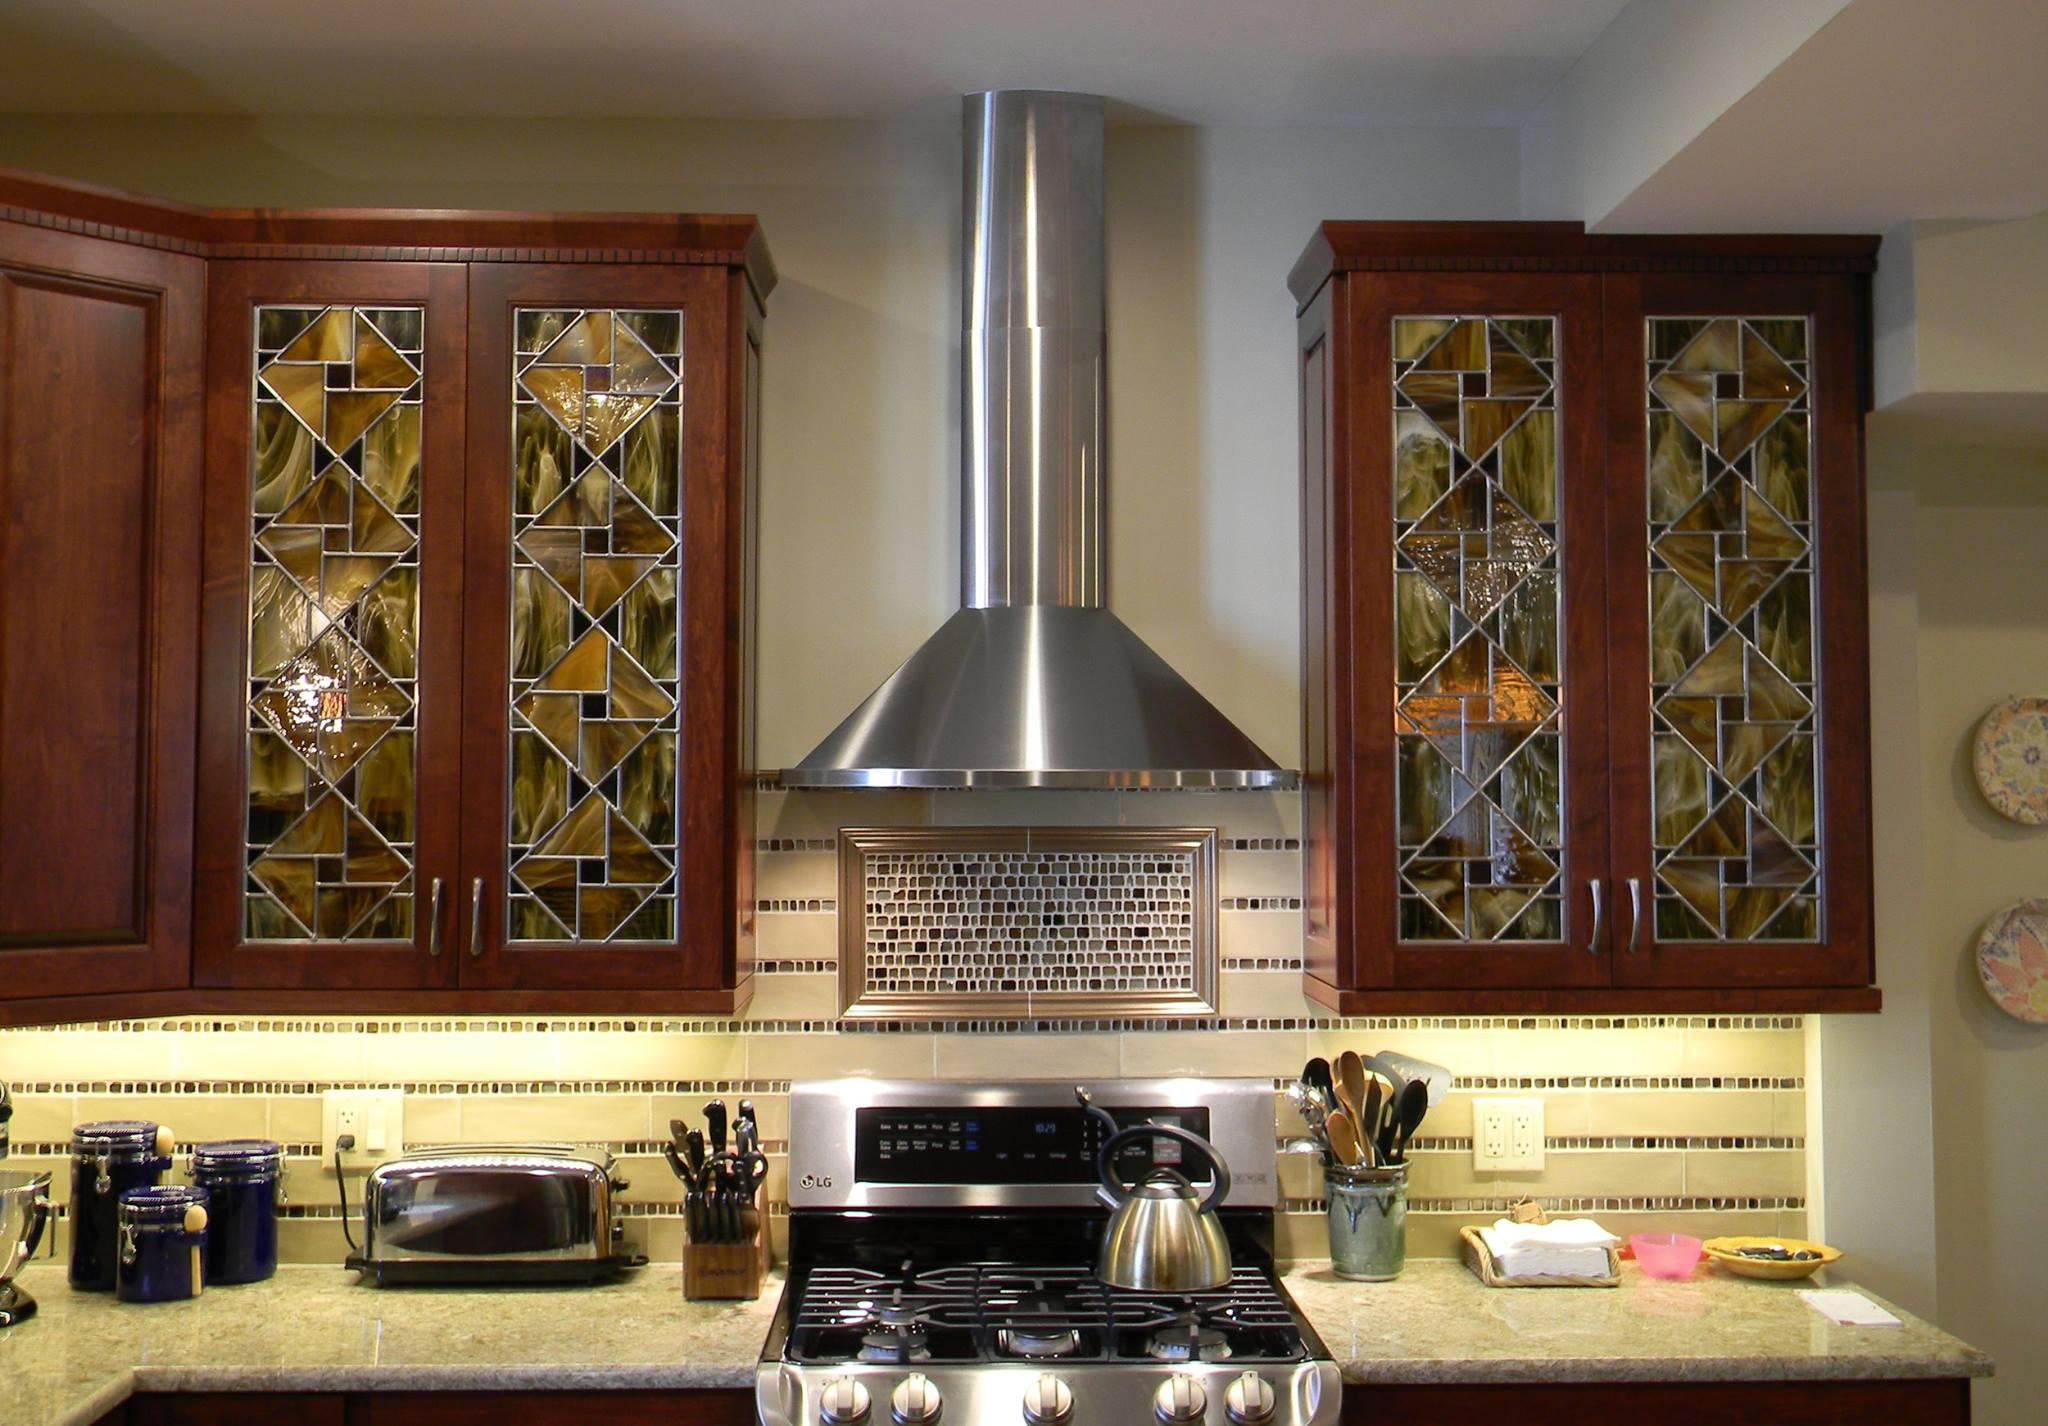 https://0201.nccdn.net/1_2/000/000/125/f39/Cabinets_Oak-Park-2048x1426.jpg